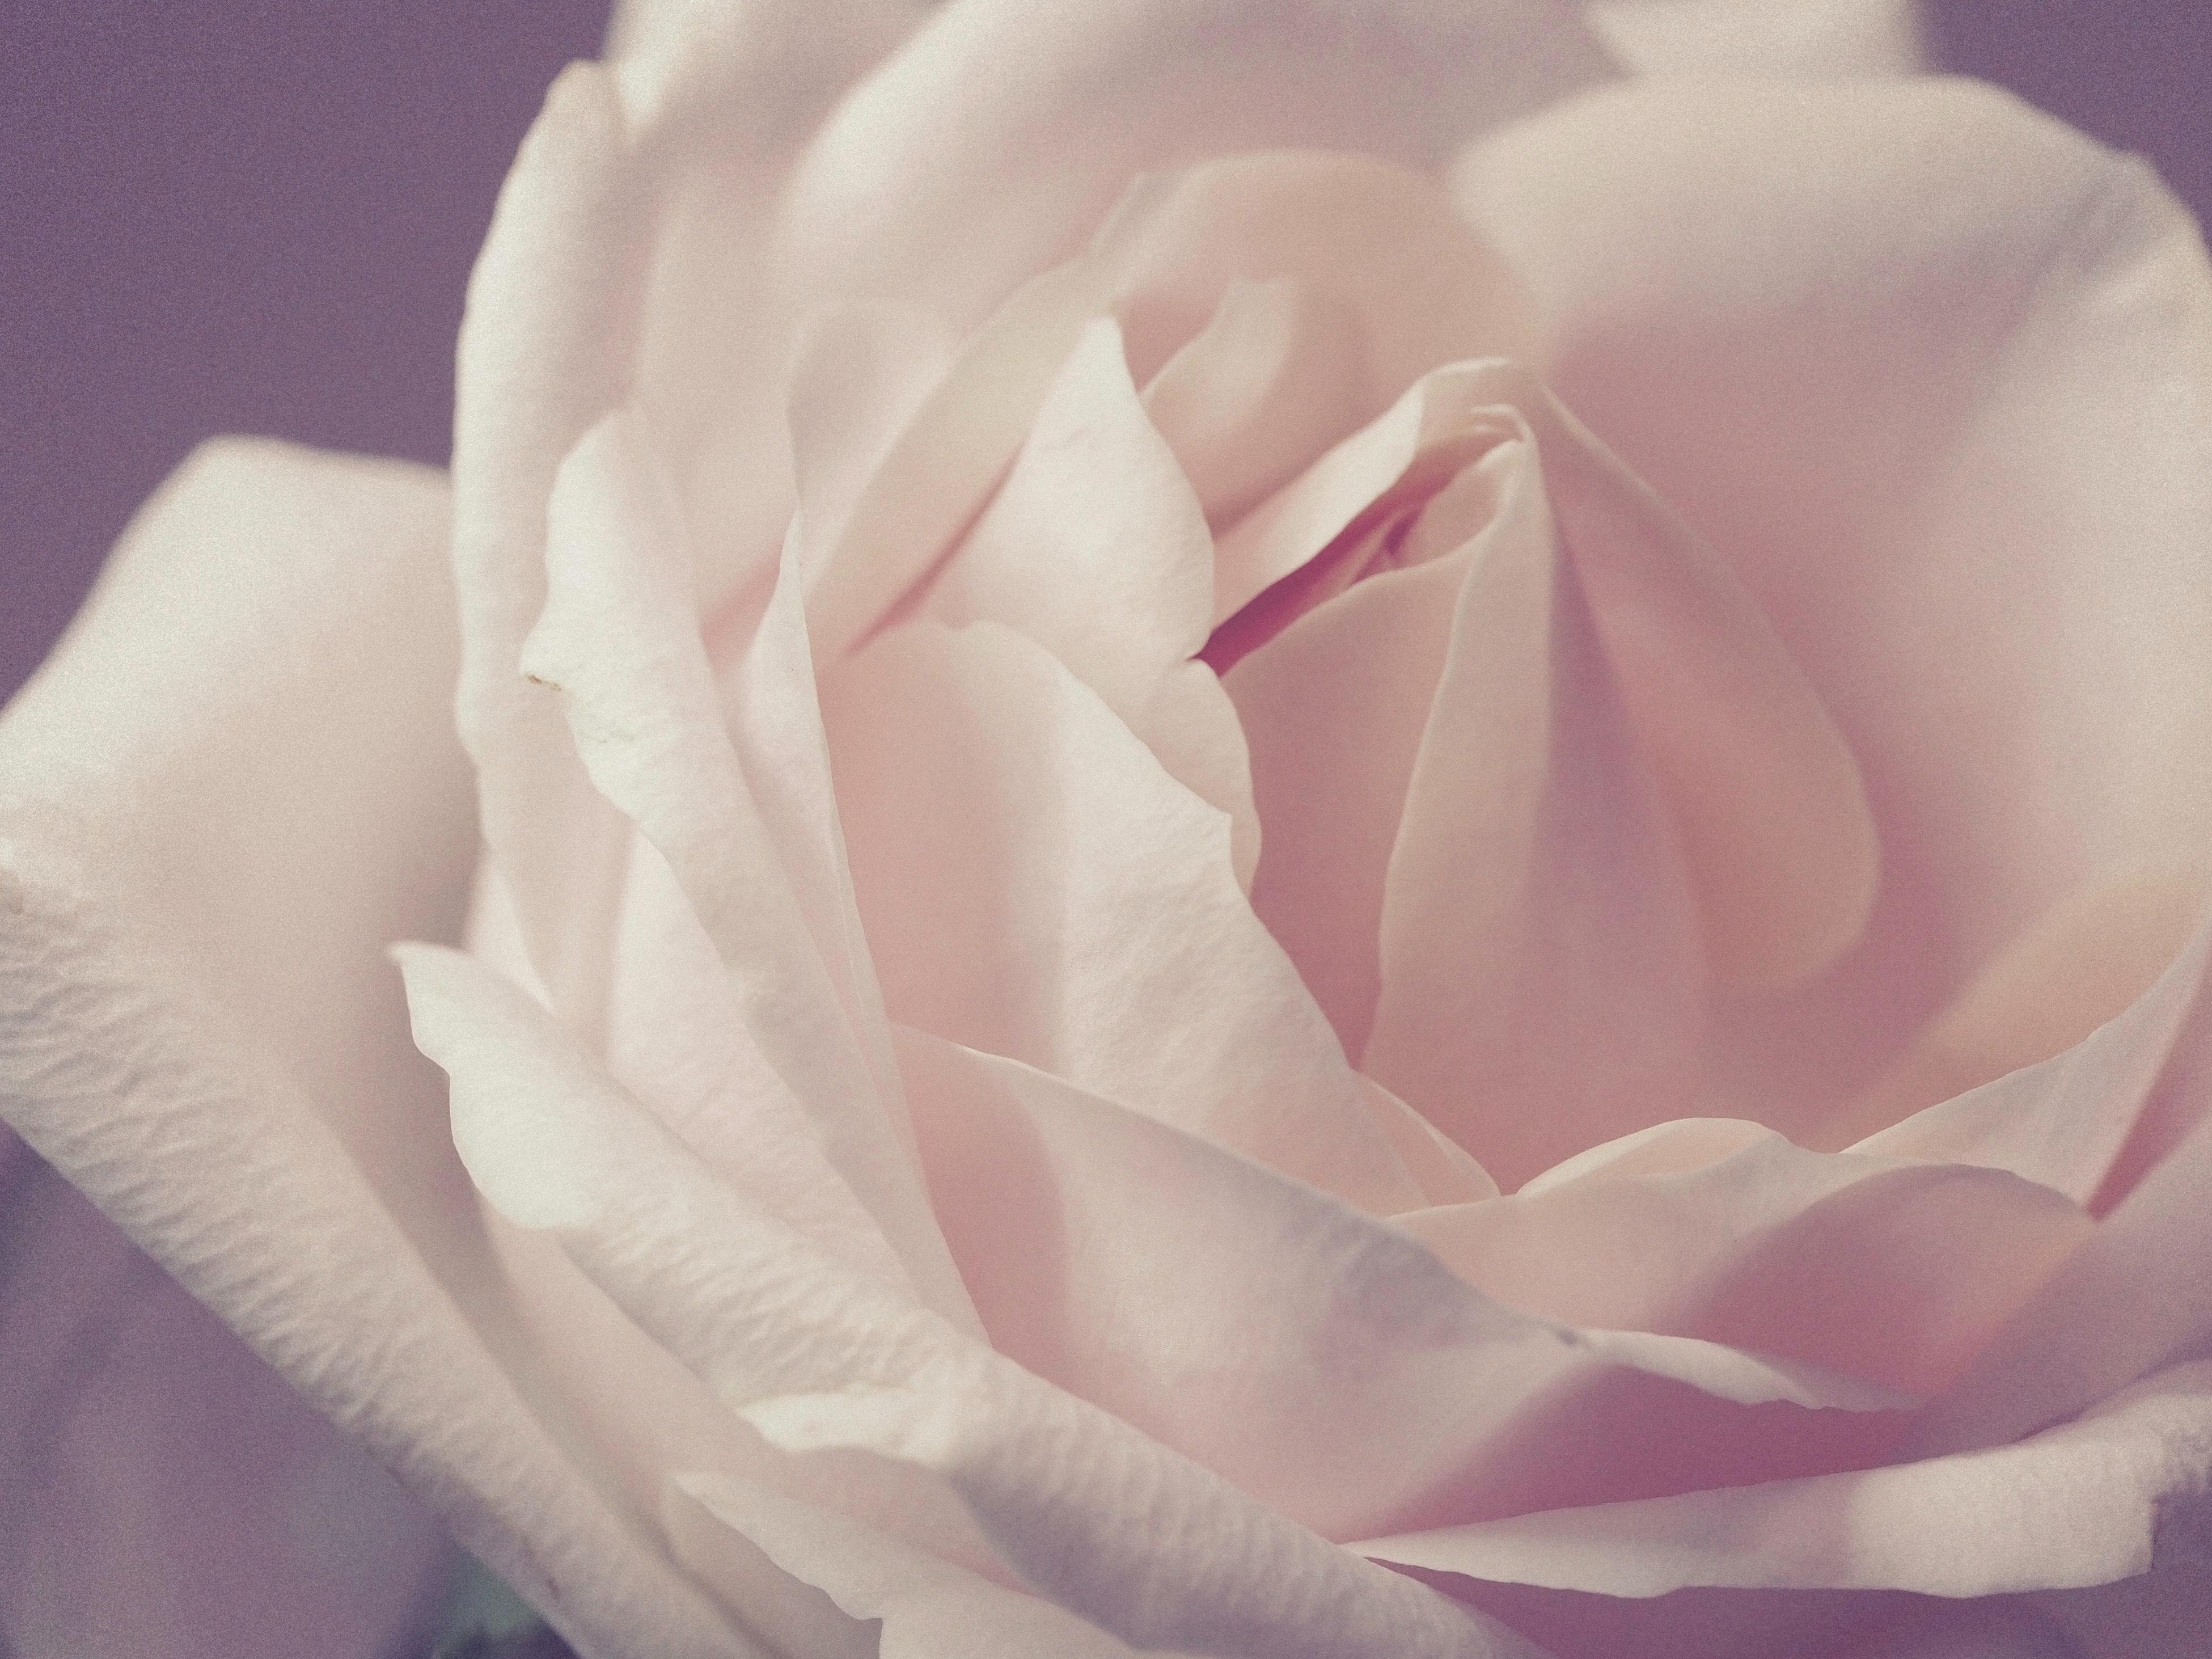 1000 Great White Rose Photos Pexels Free Stock